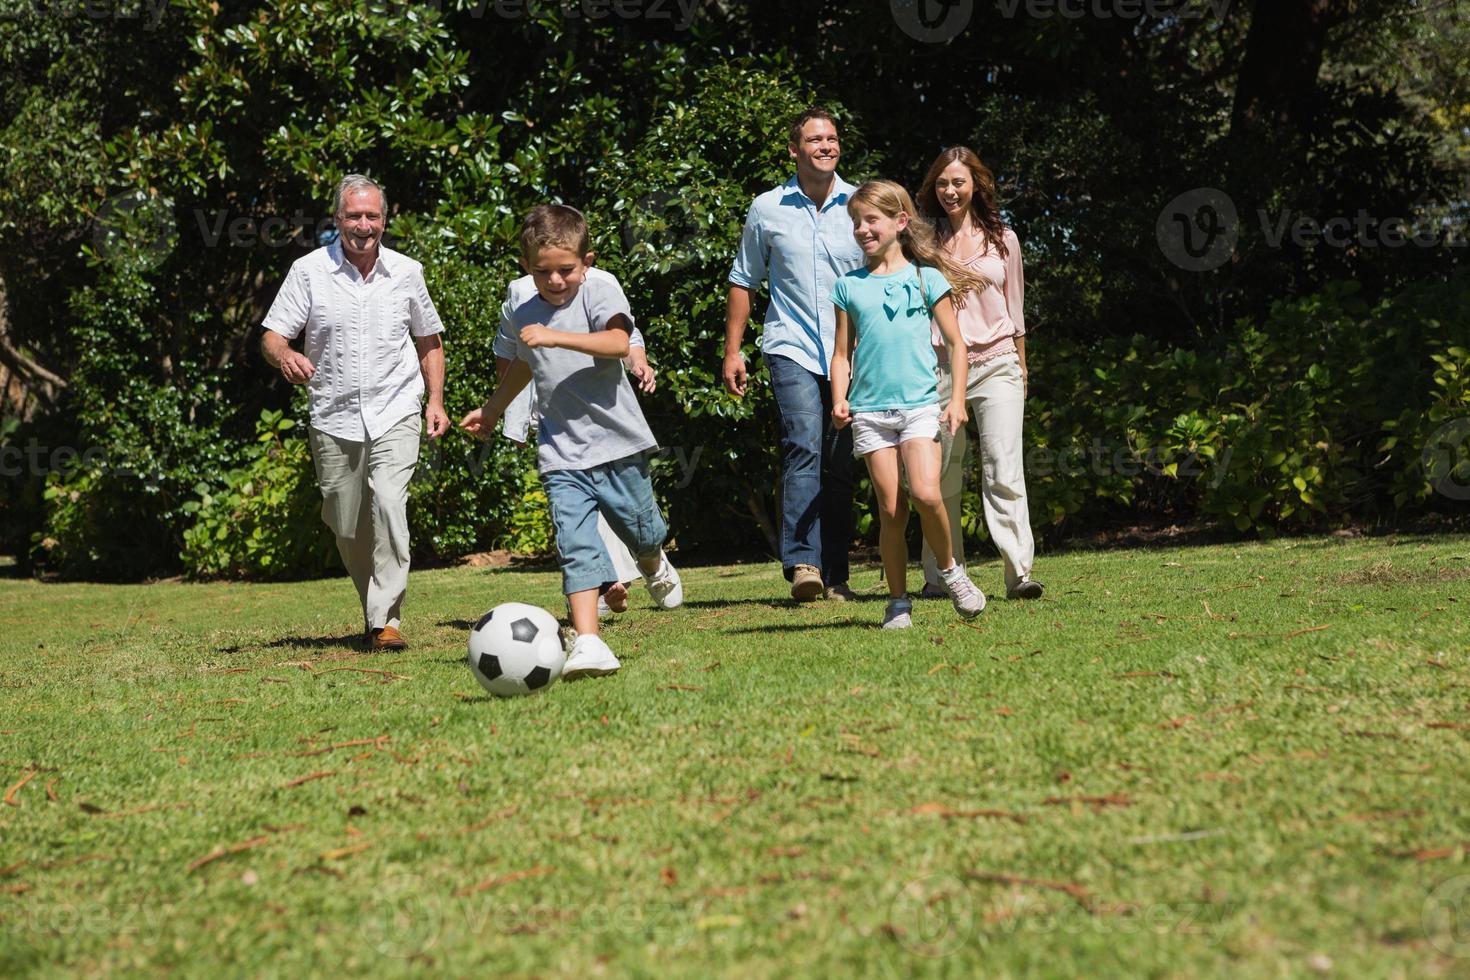 Happy multi generation family playing football photo